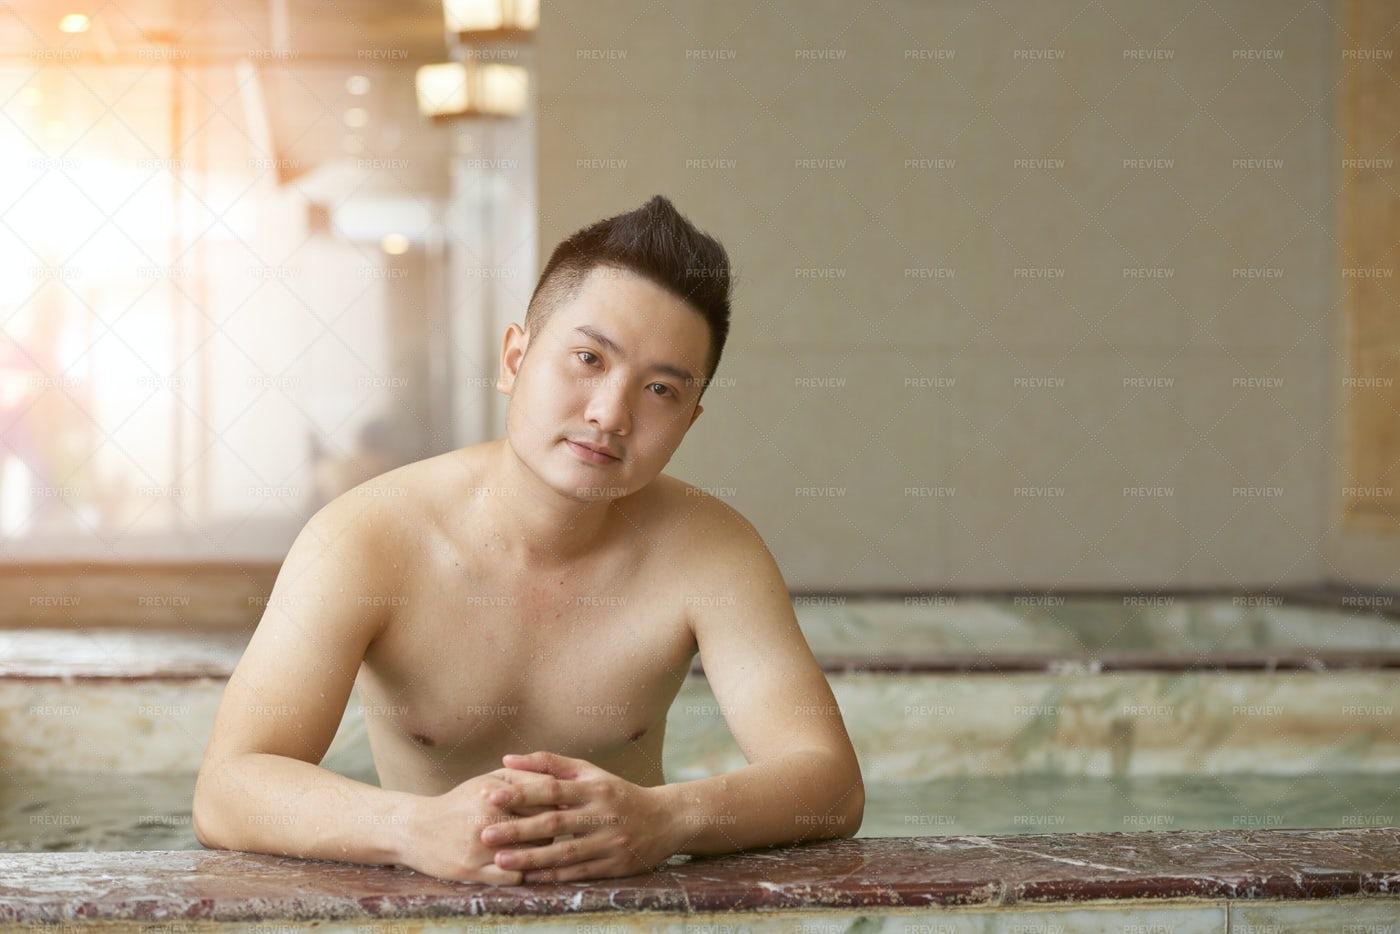 Young Man In Wellnes Centre: Stock Photos